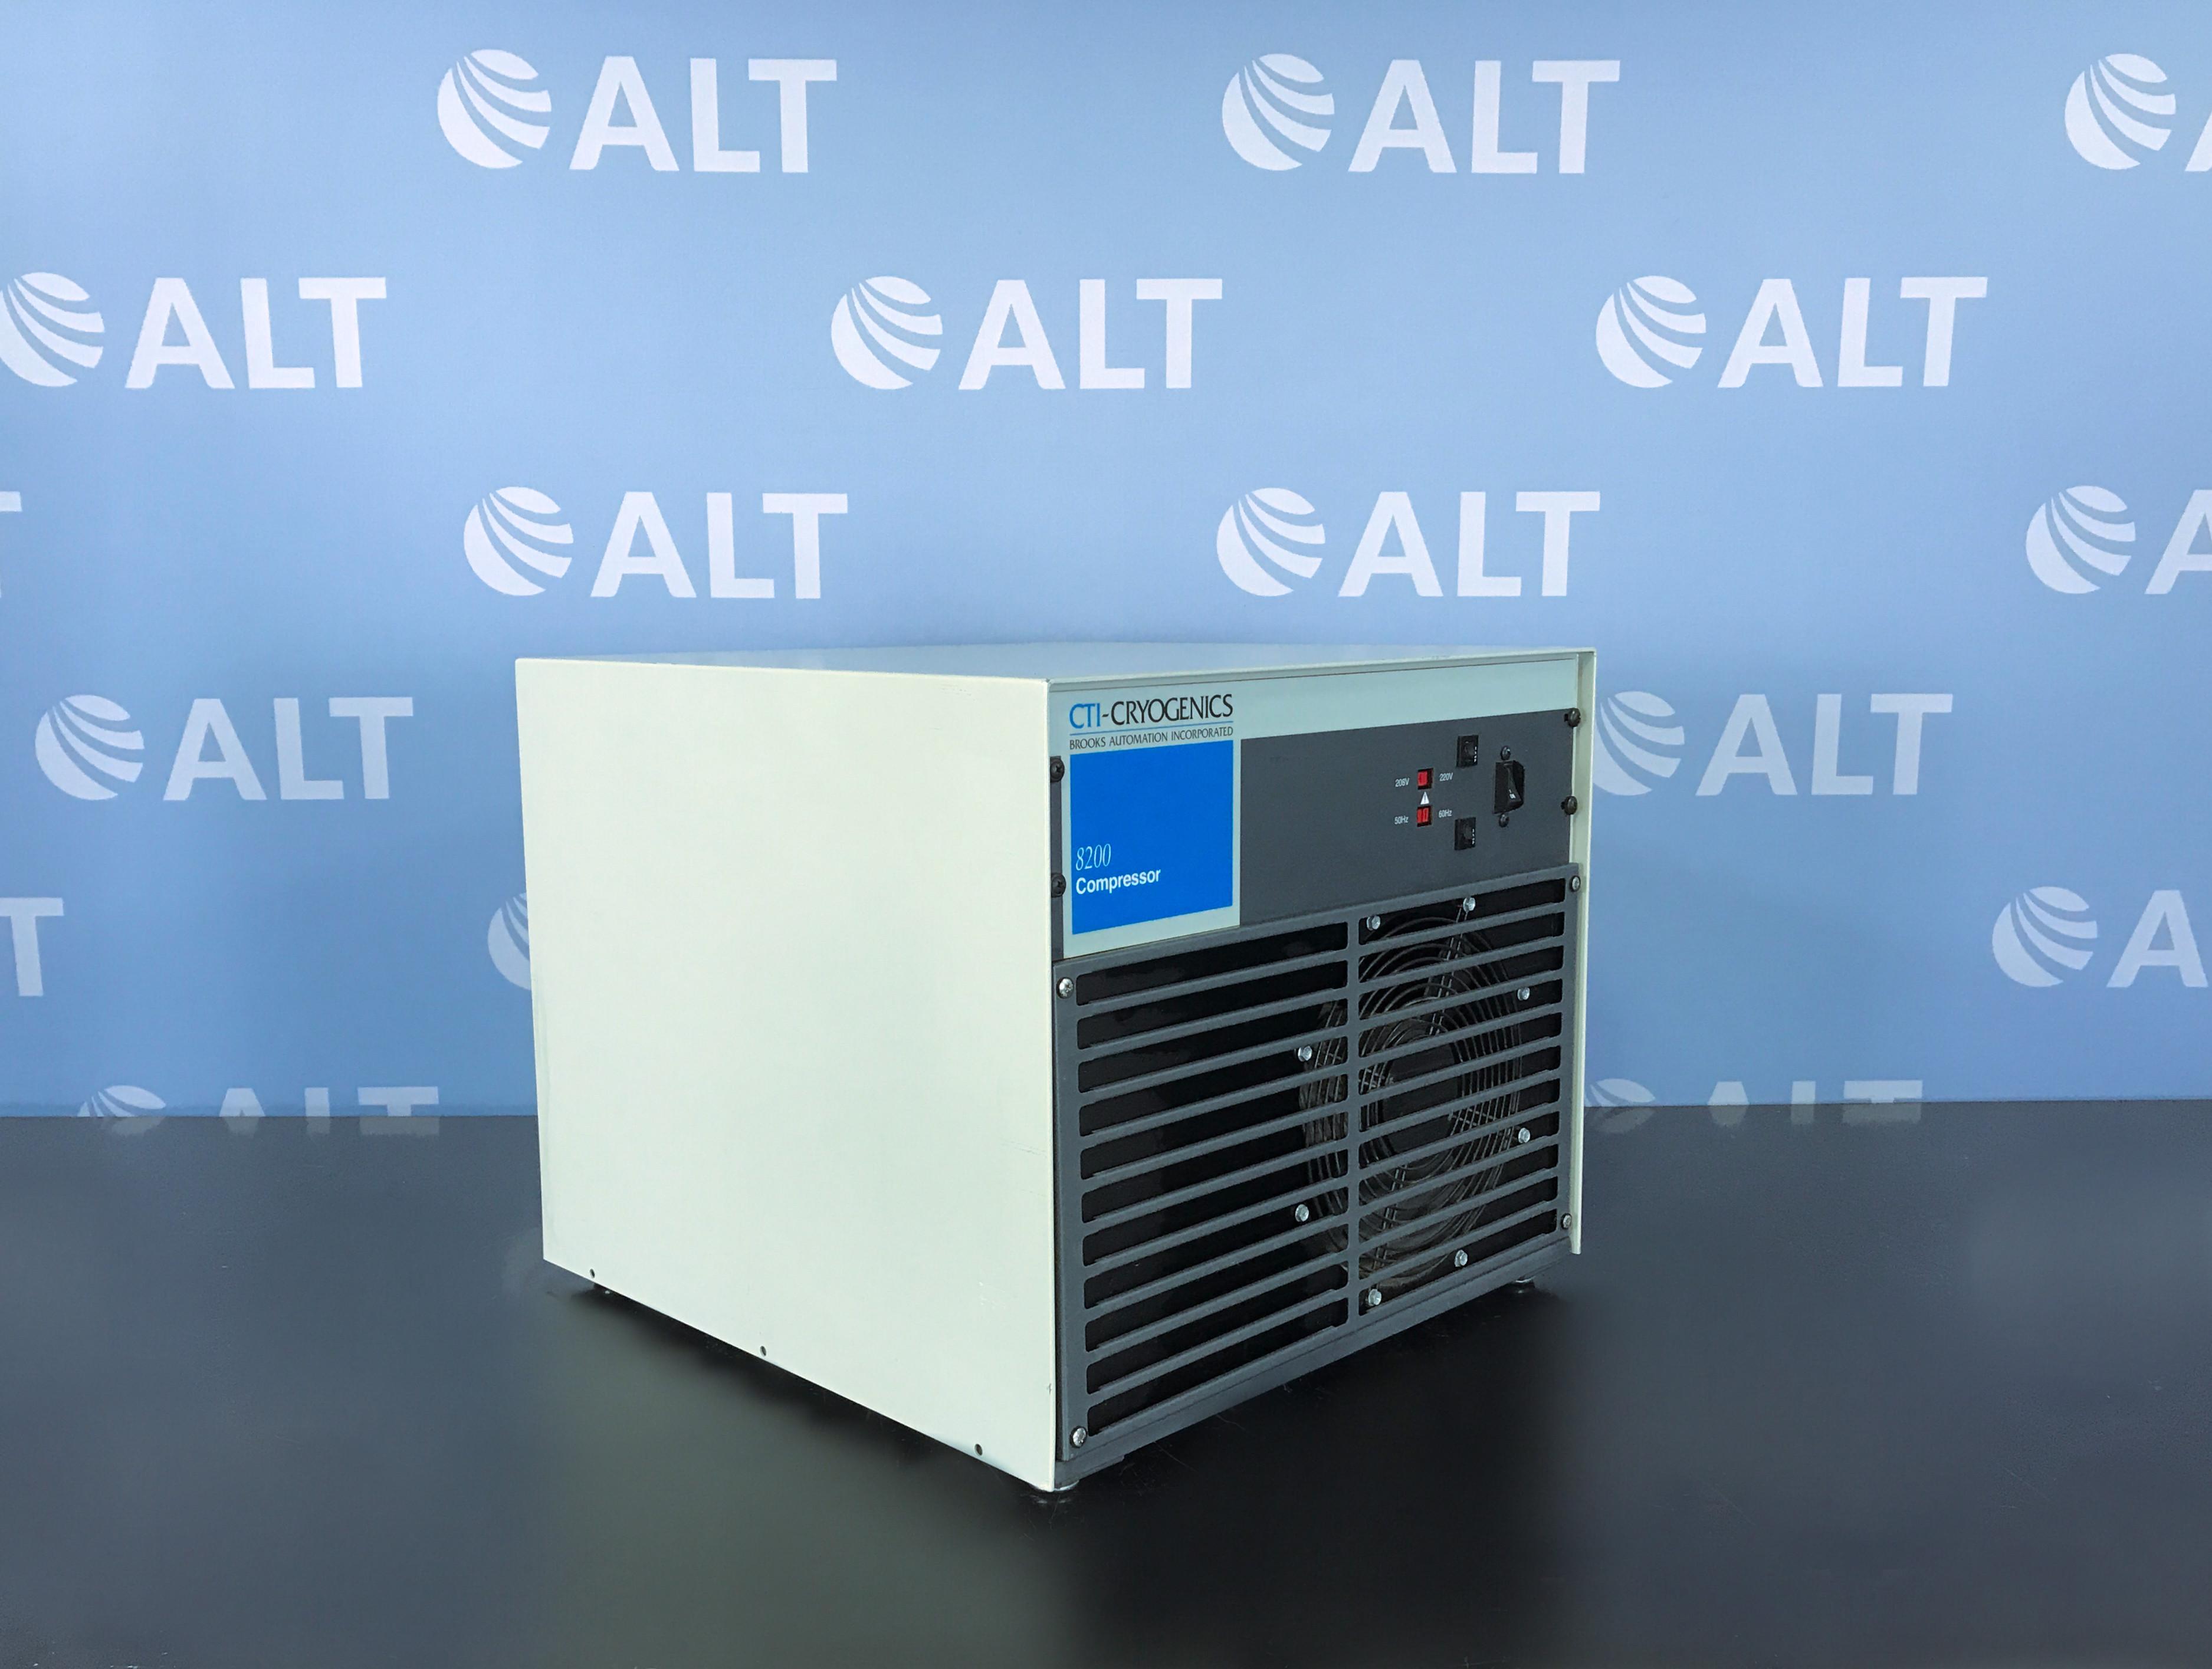 Brooks Automation CTI-Cryogenics 8200 Compressor Image